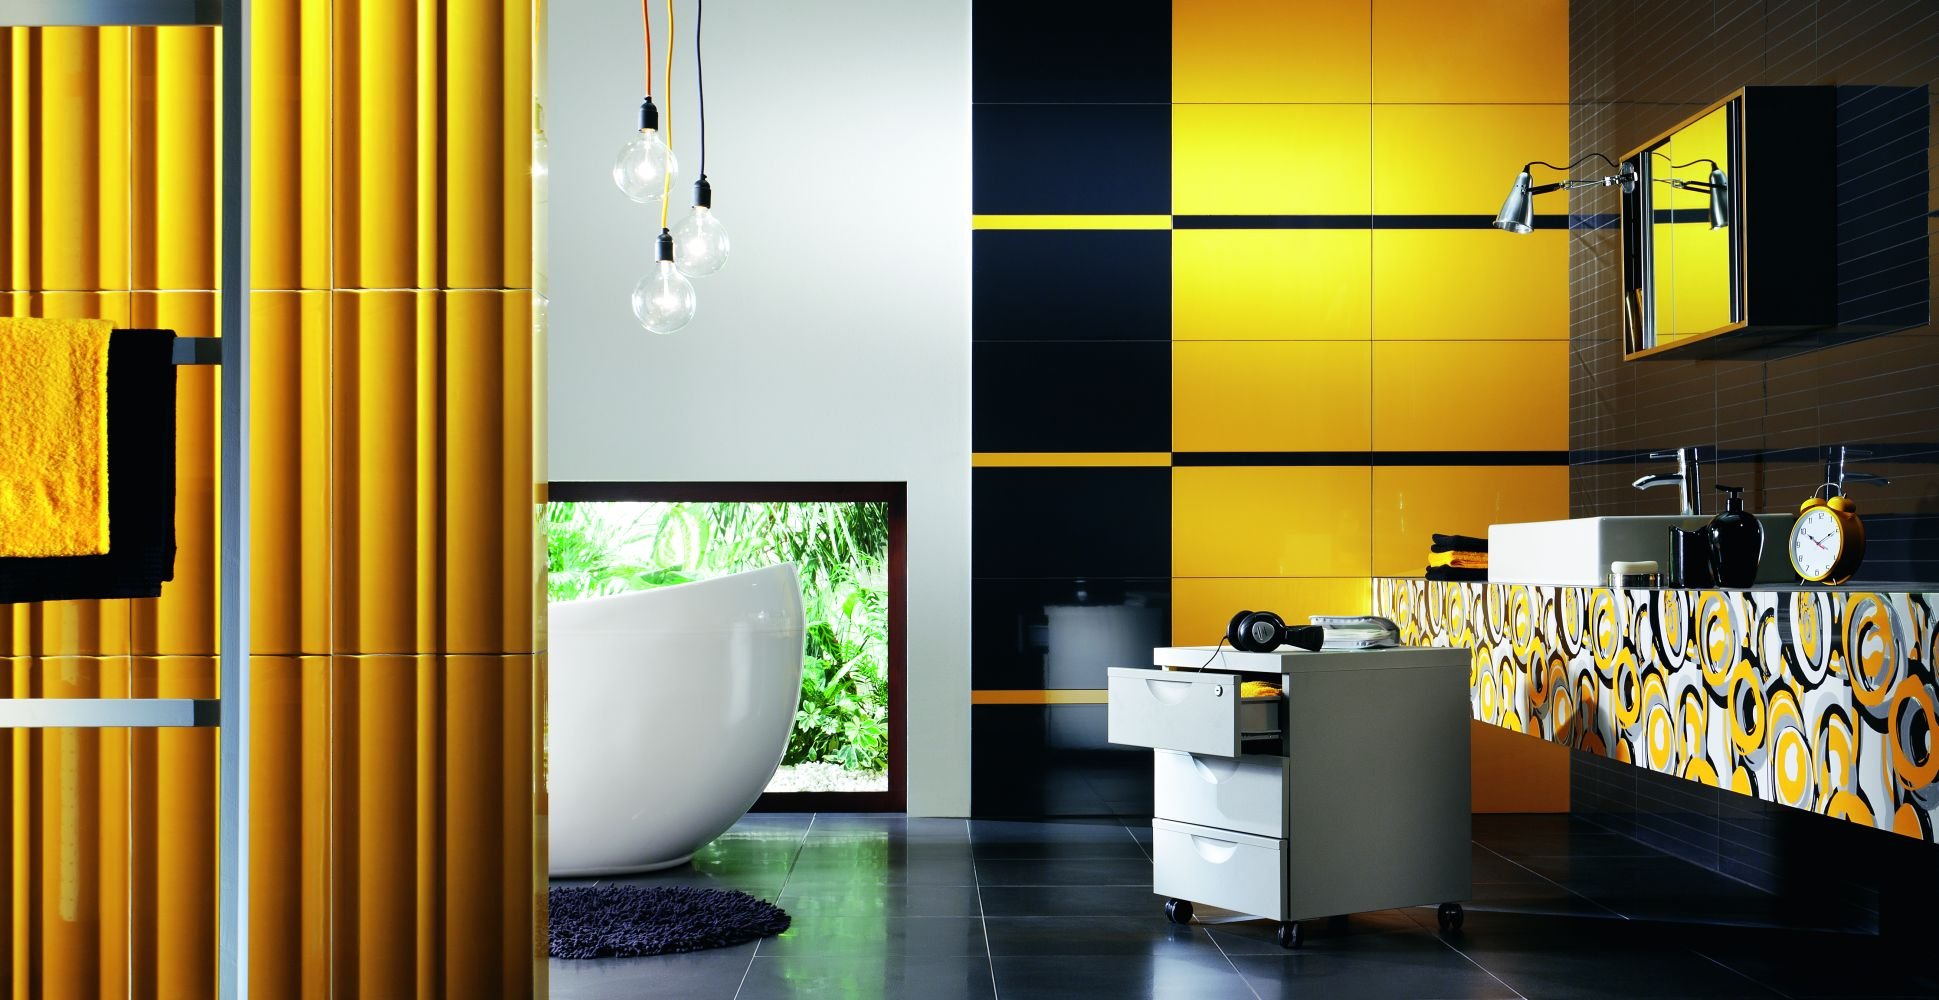 Просторная желто-черно-белая ванная комната